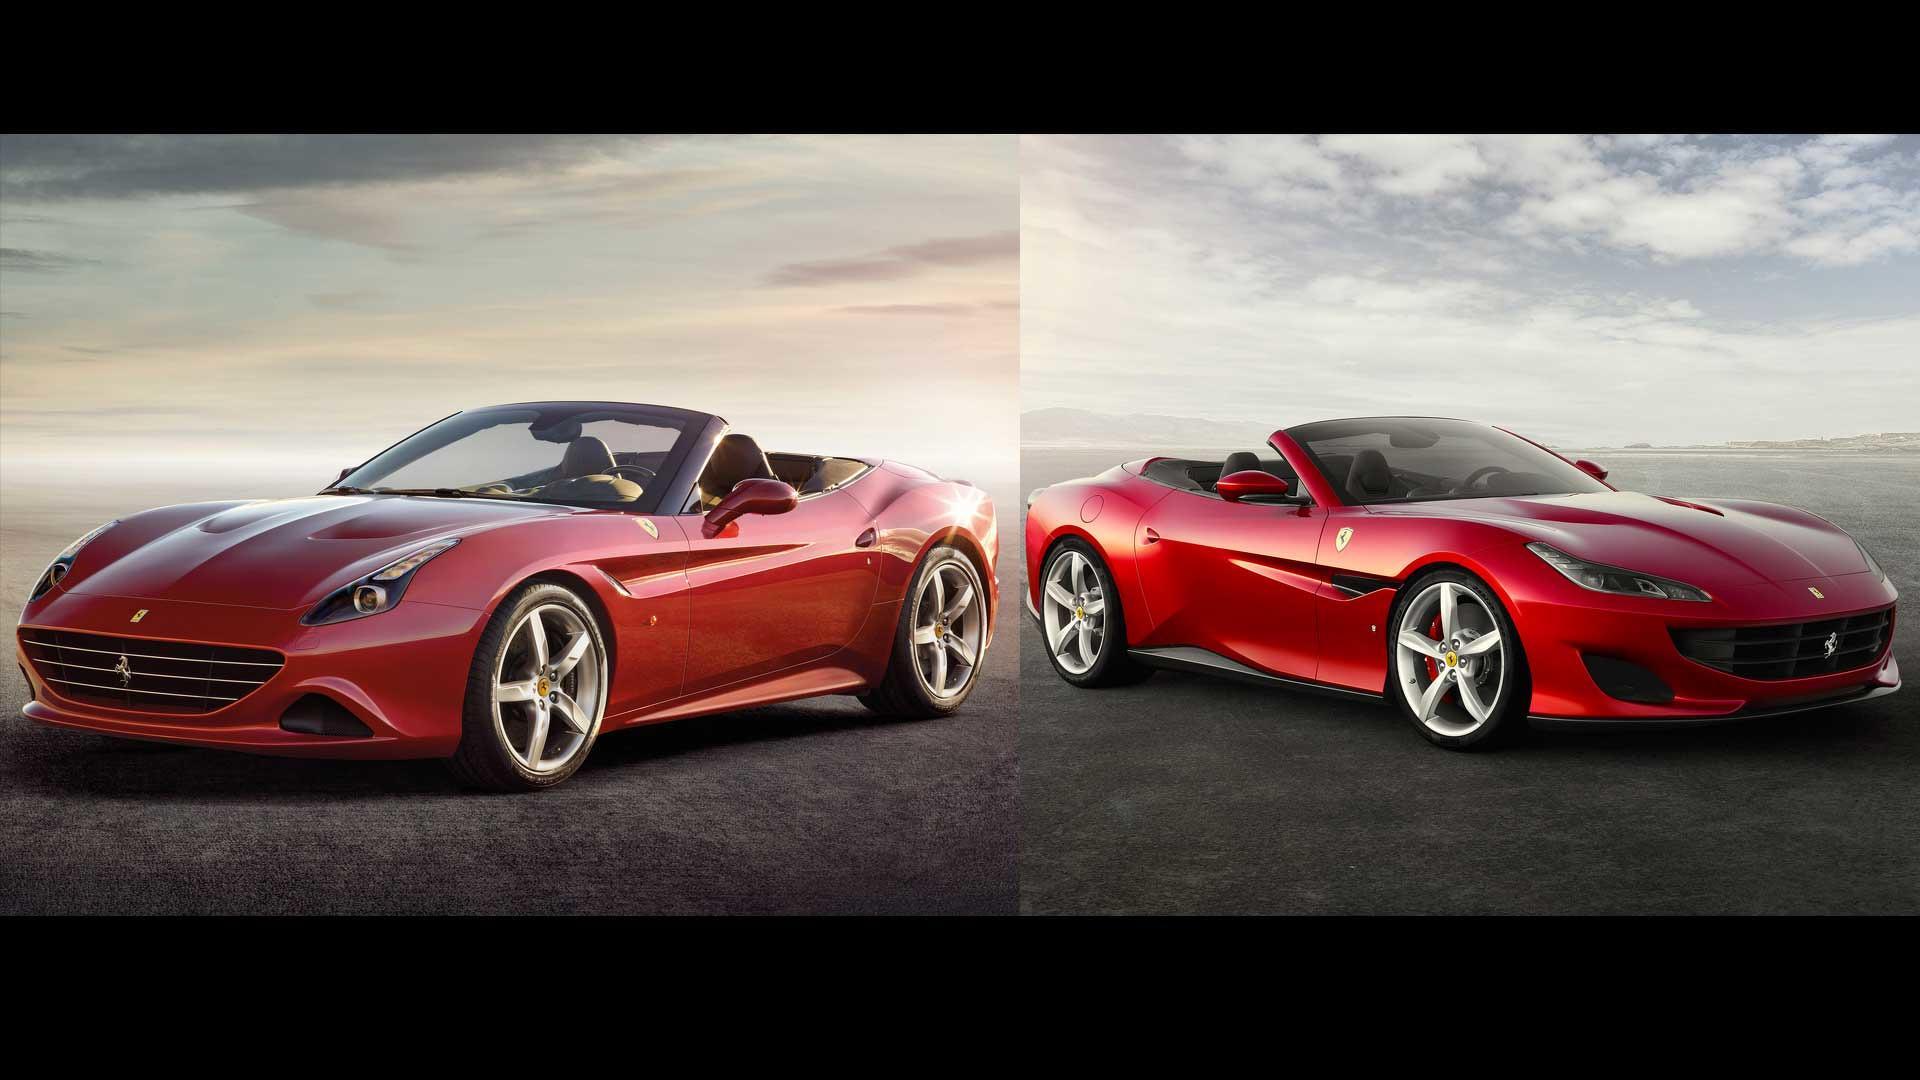 Ferrari Portofino Vs California T: See The Changes Side-By ...